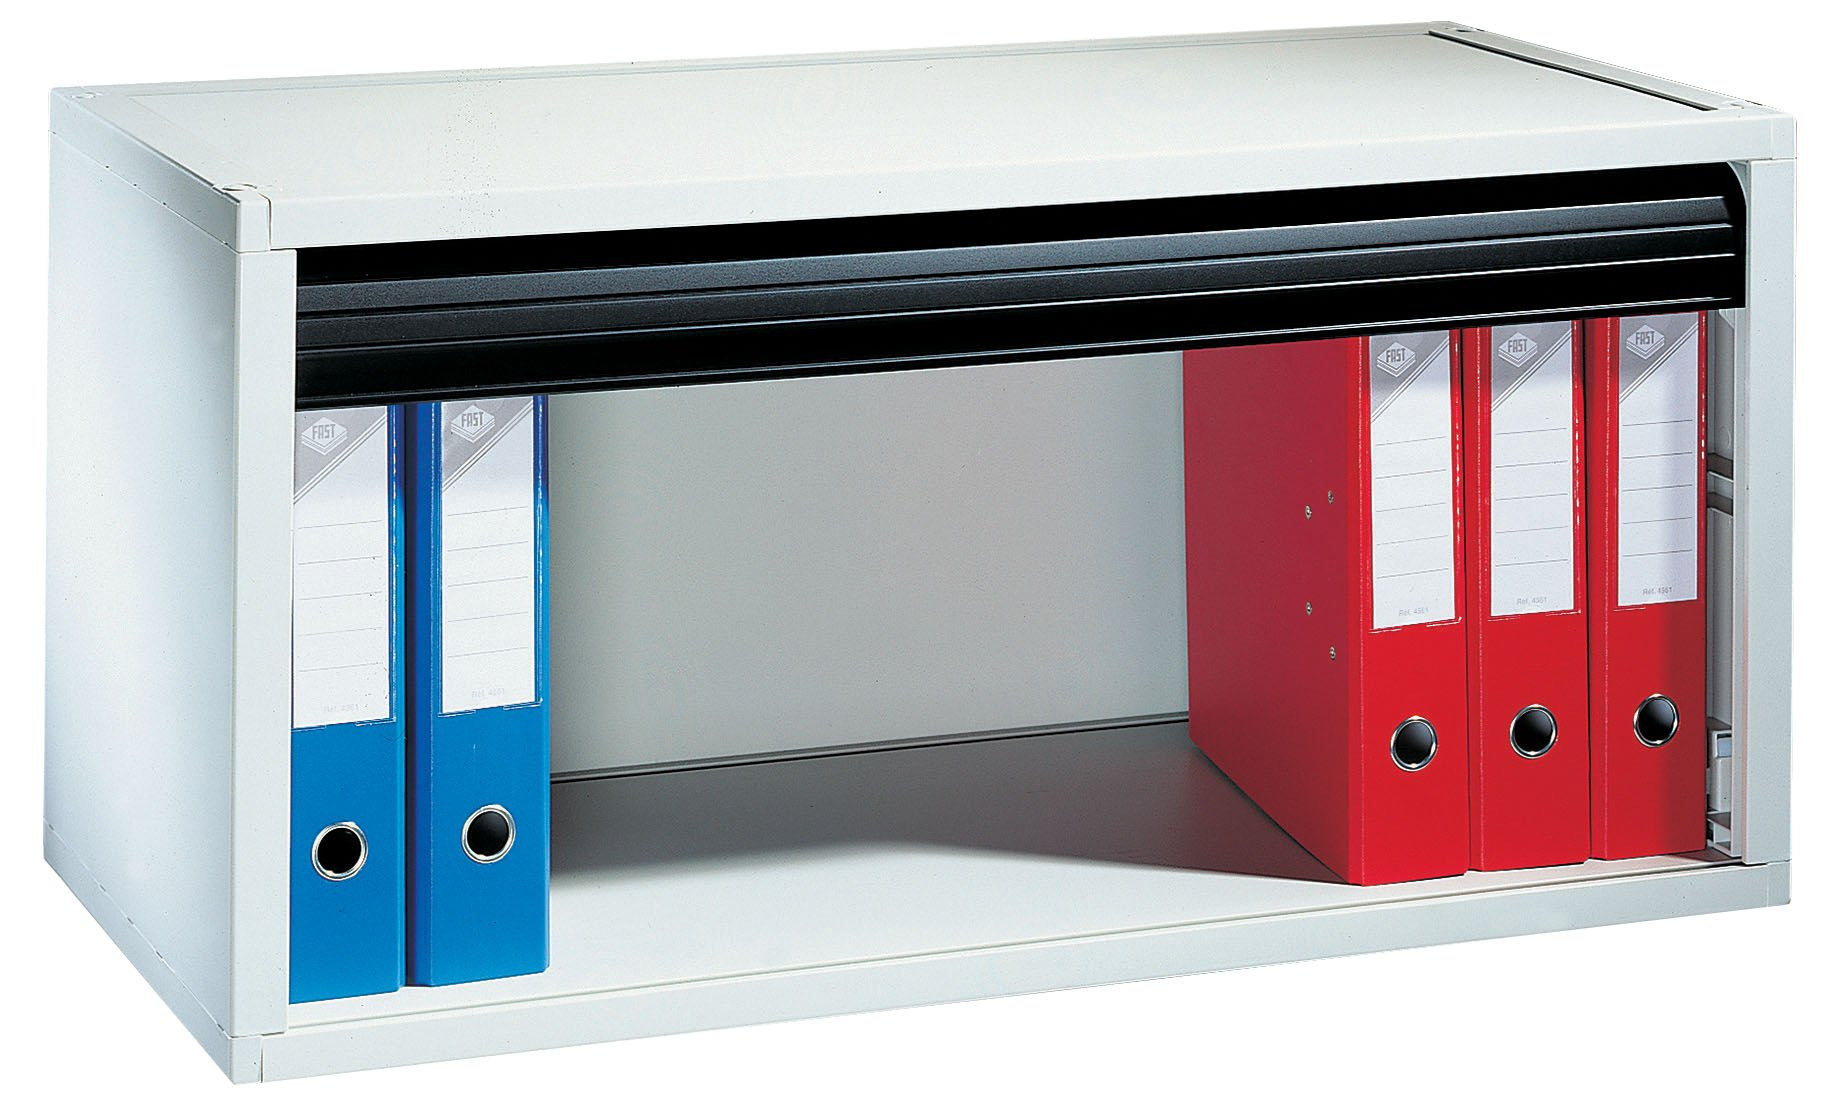 PaperFlow Multibloc Storage Module, 66 Pound Capacity, 17.2x35.13x15.75 Inches, Black (4901.01)